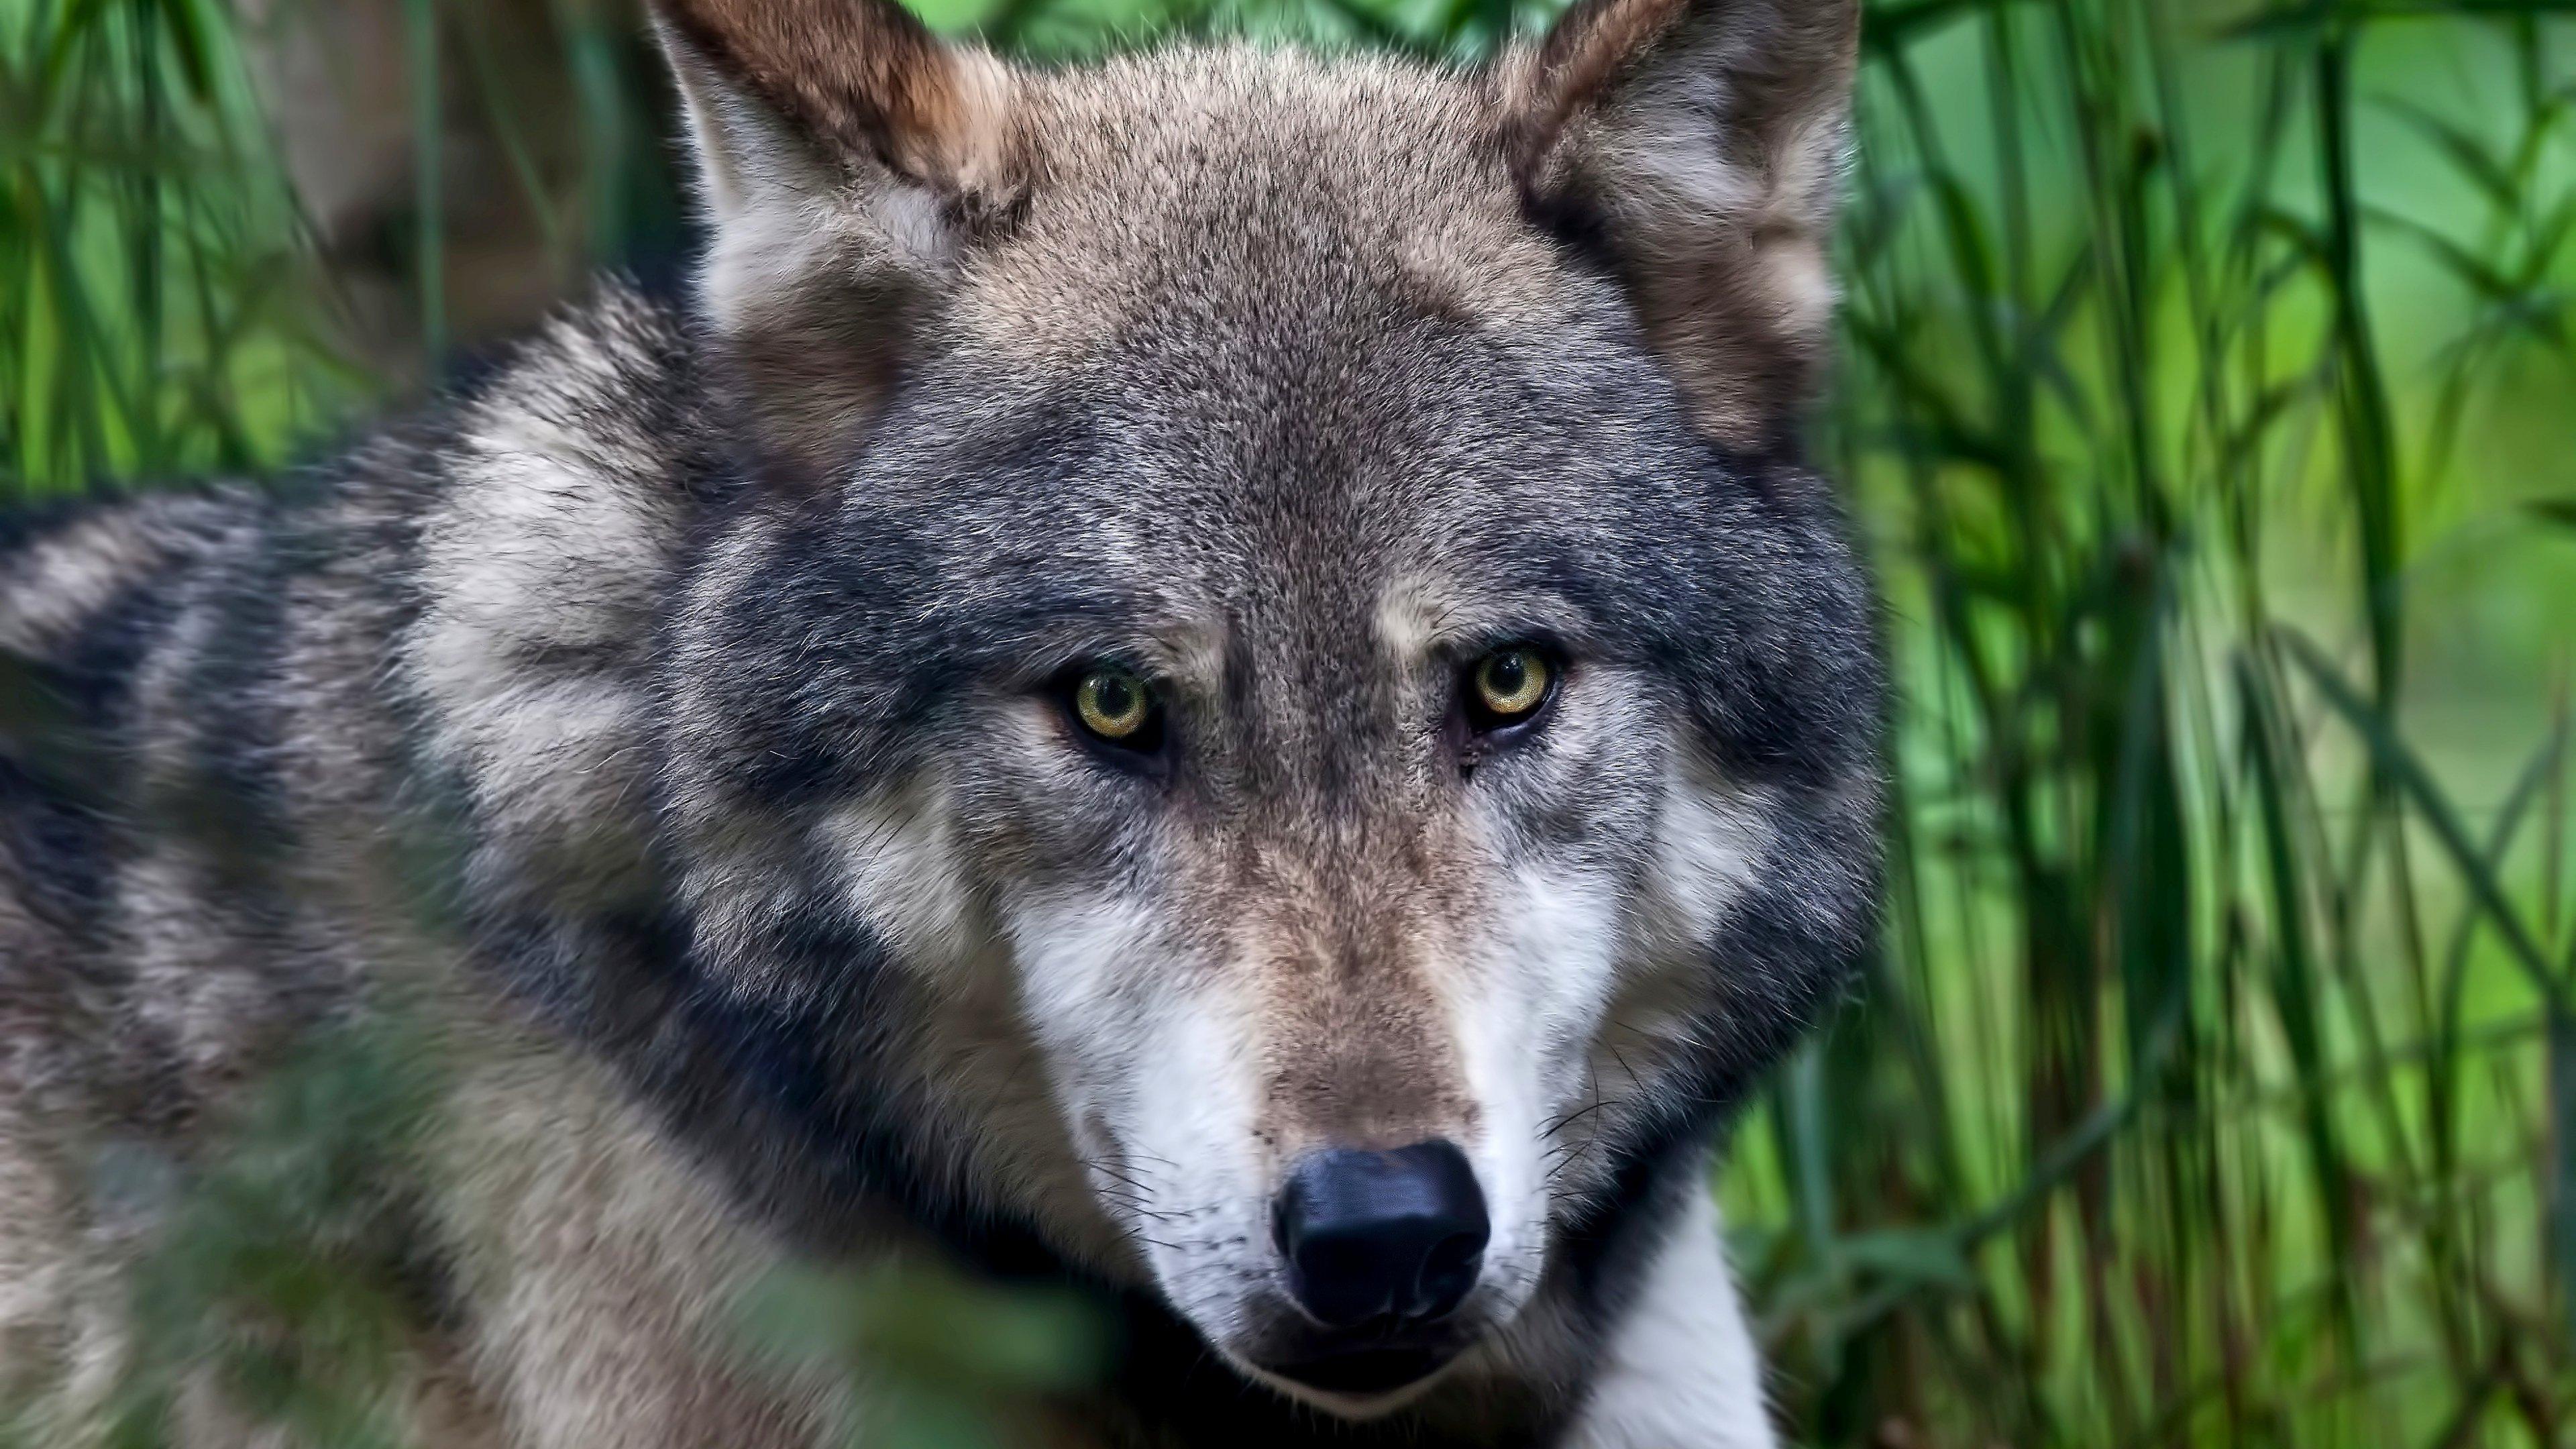 Ultra HD Wallpaper 38402160 wolf face color predator 4K Ultra HD 3840x2160